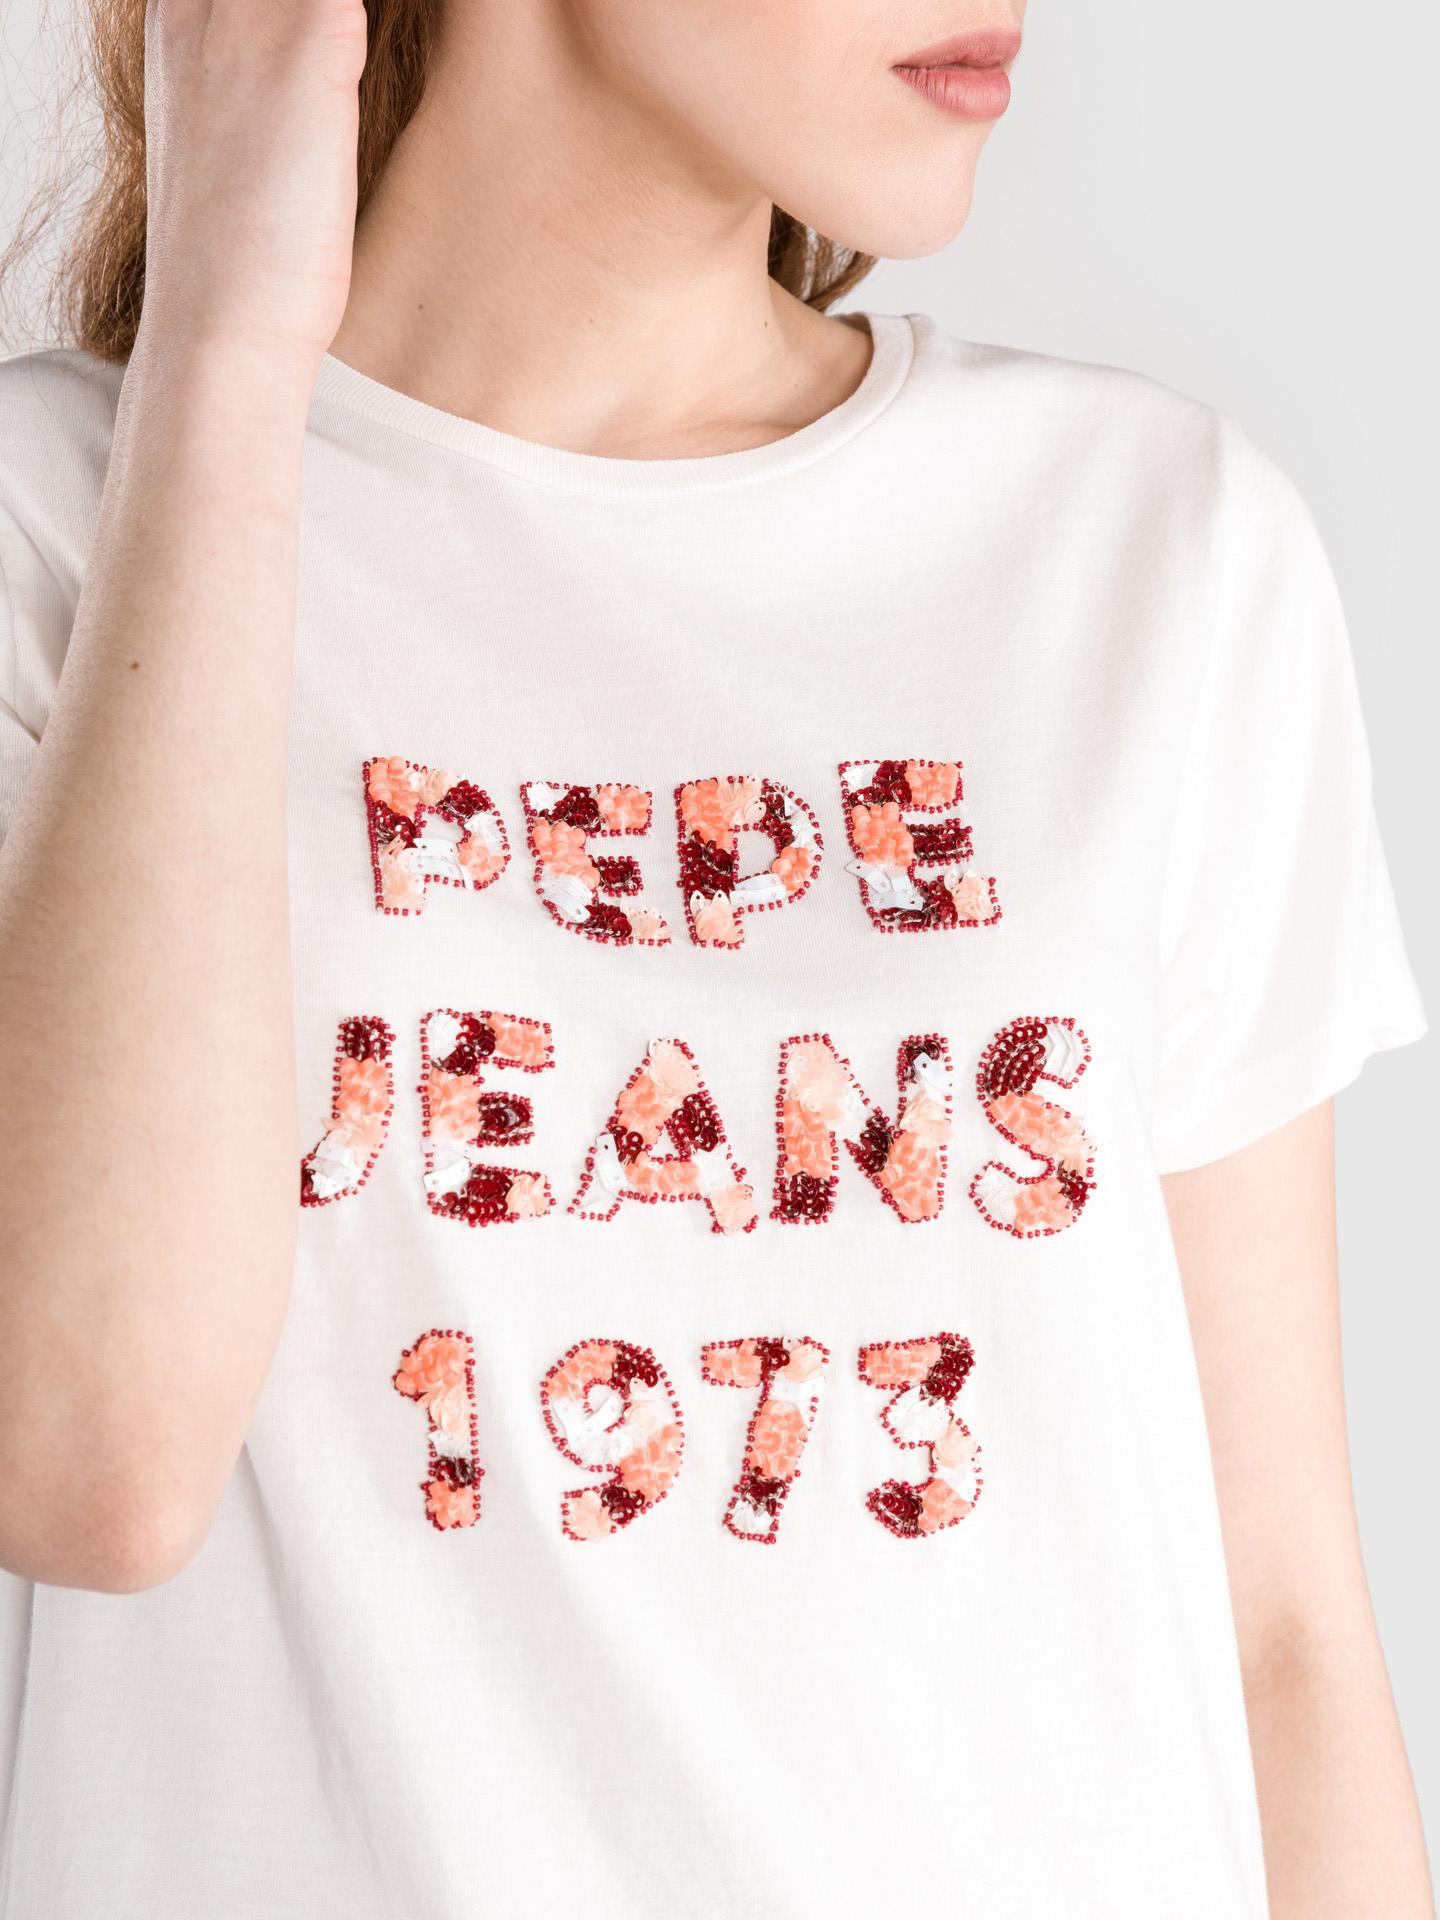 Pepe Jeans Marnie T-shirt bianca